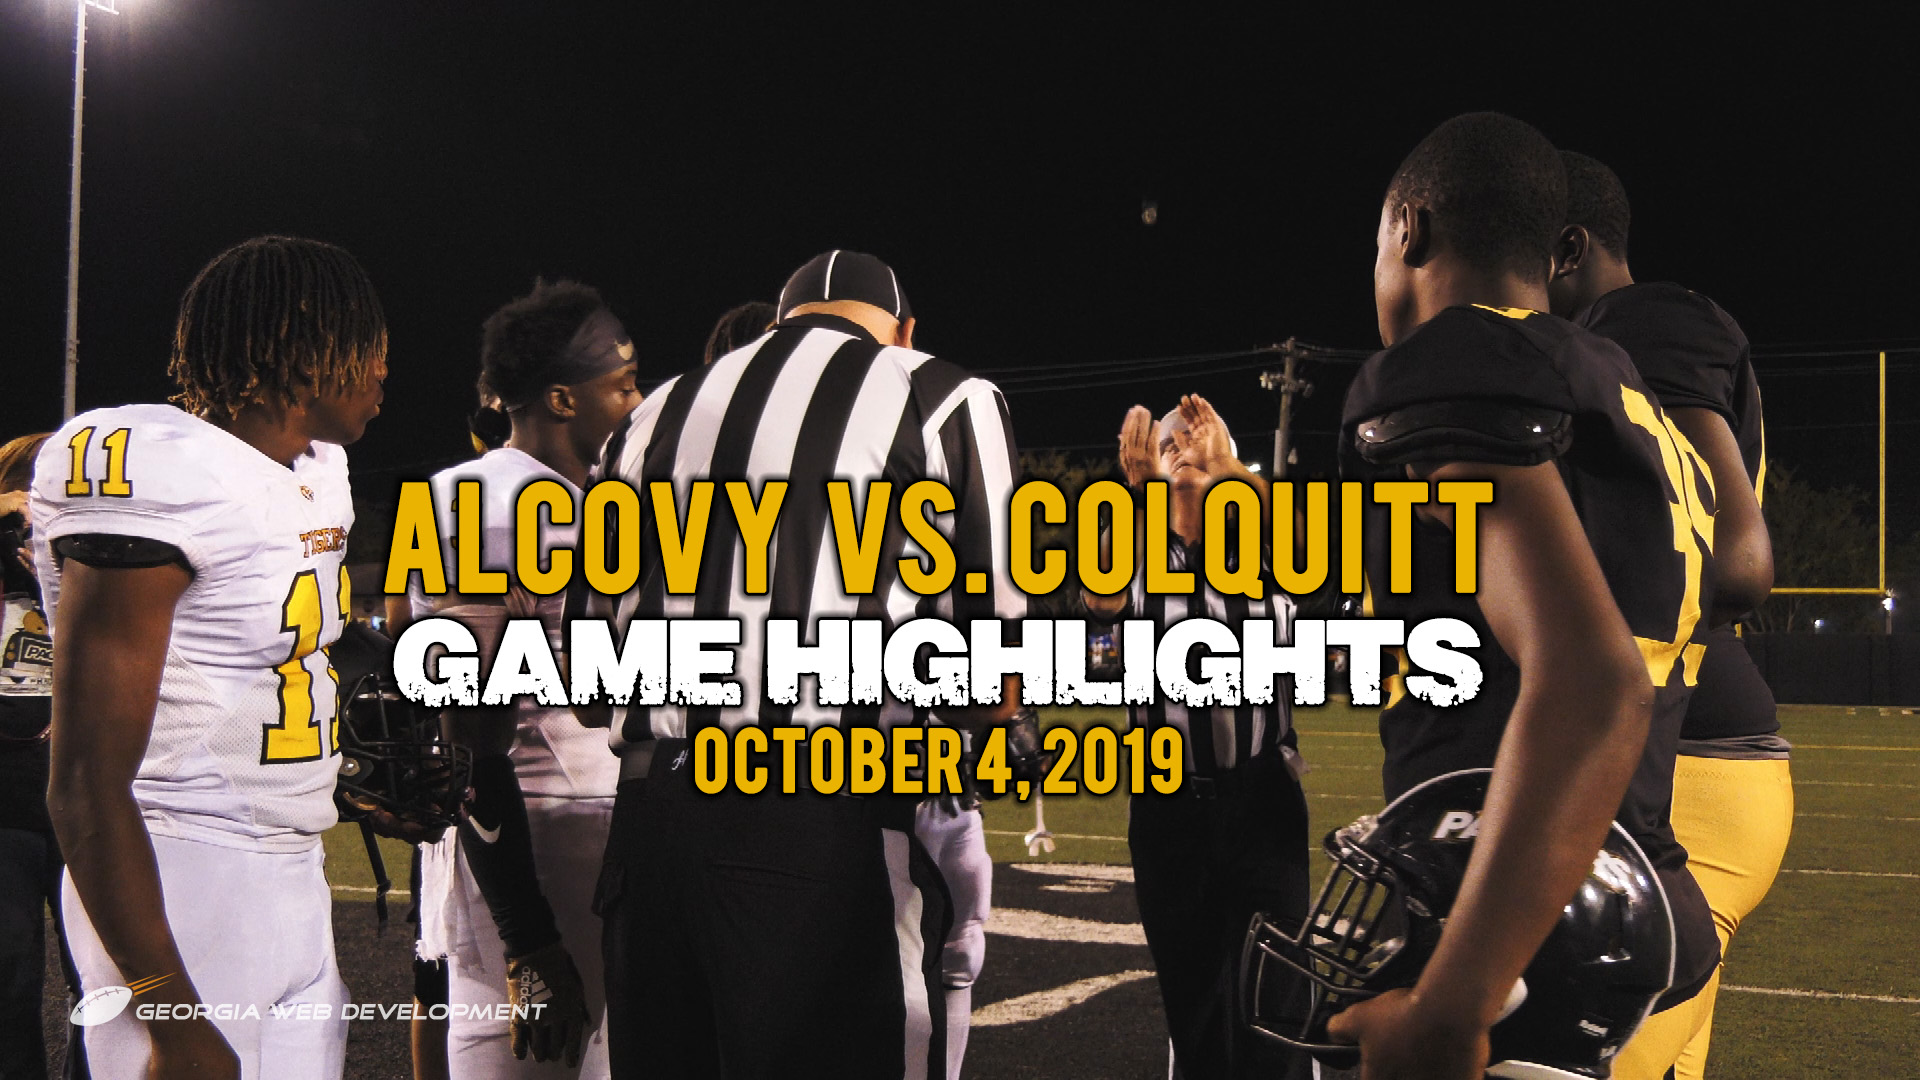 Alcovy vs. Colquitt 2019 | High School Football Game Highlights